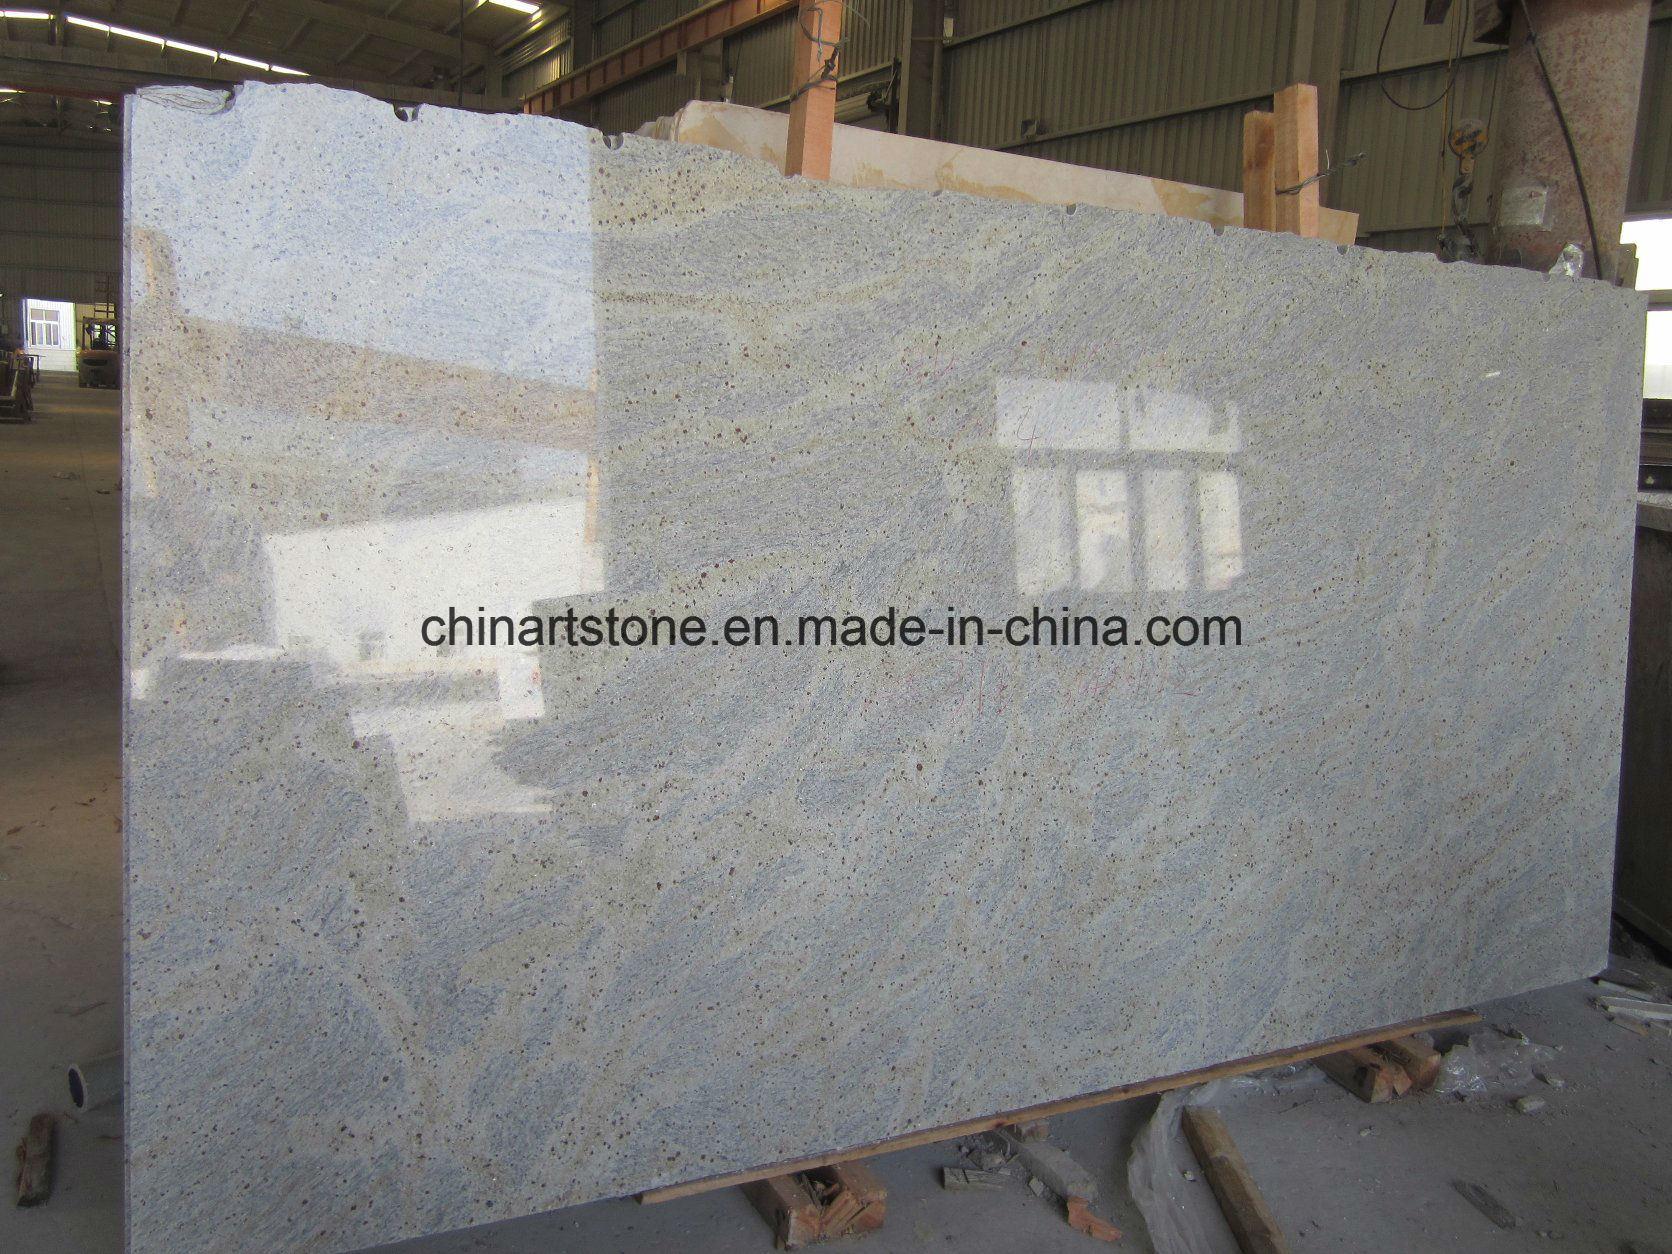 China Kashmire White Granite Stone For Floor China Granite Stone